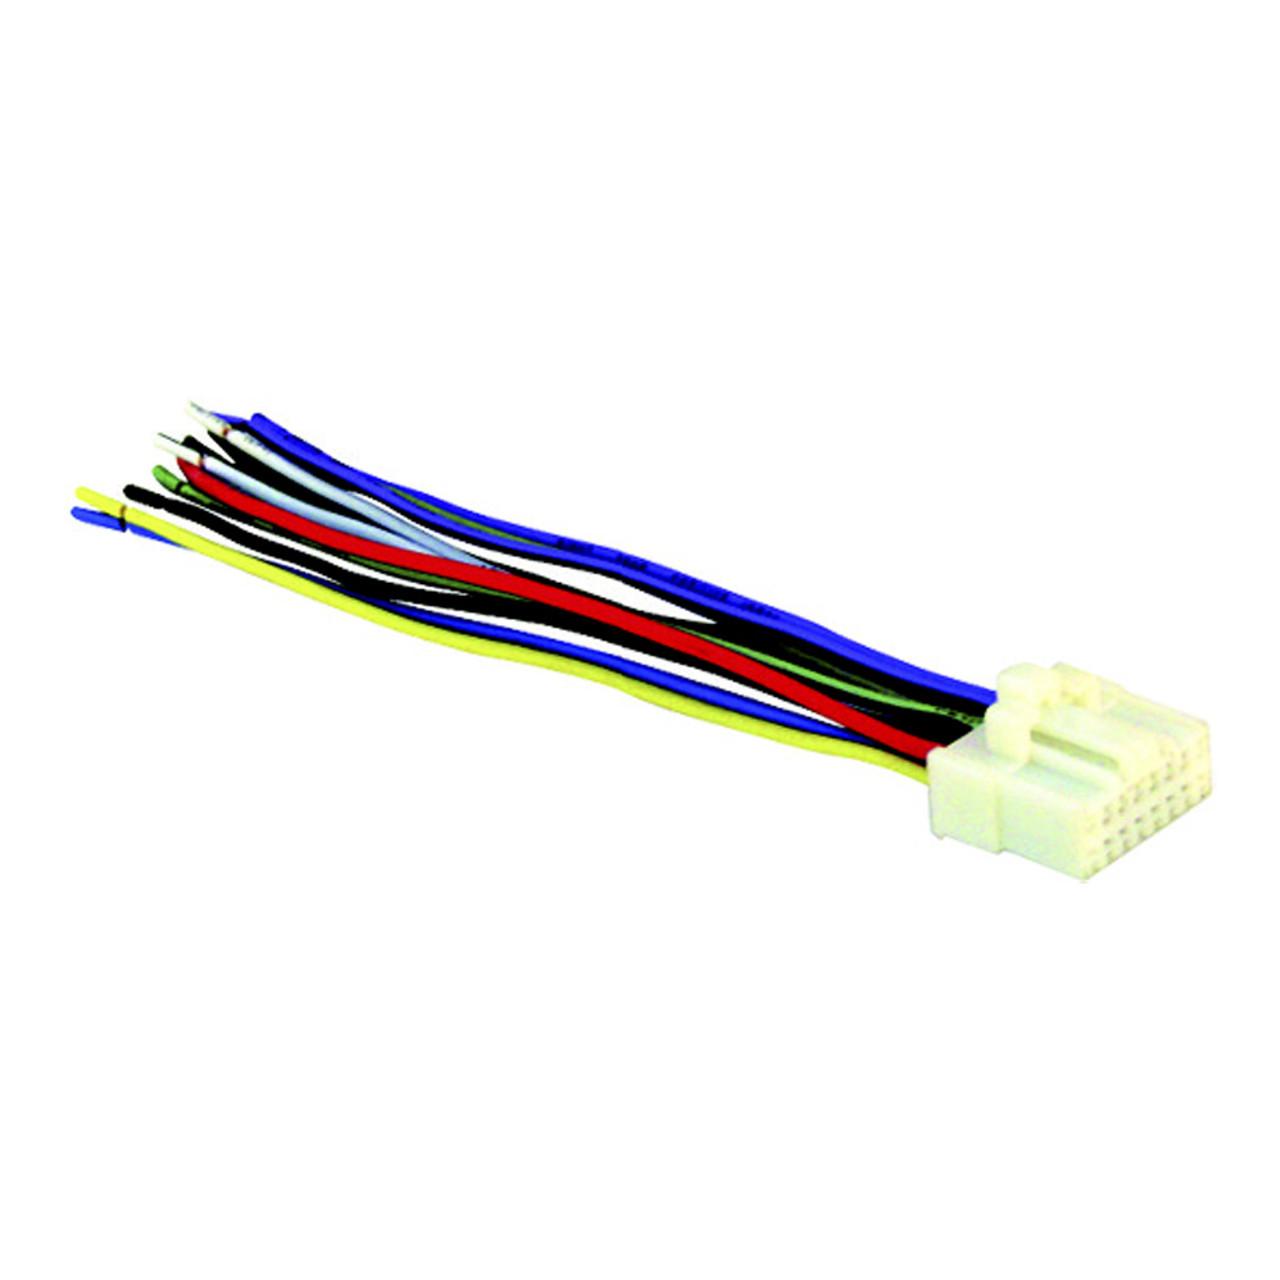 hight resolution of wiring harness panasonic 2000 2005 16 pin xscorpion wiring harness panasonic 2000 2005 16 pin